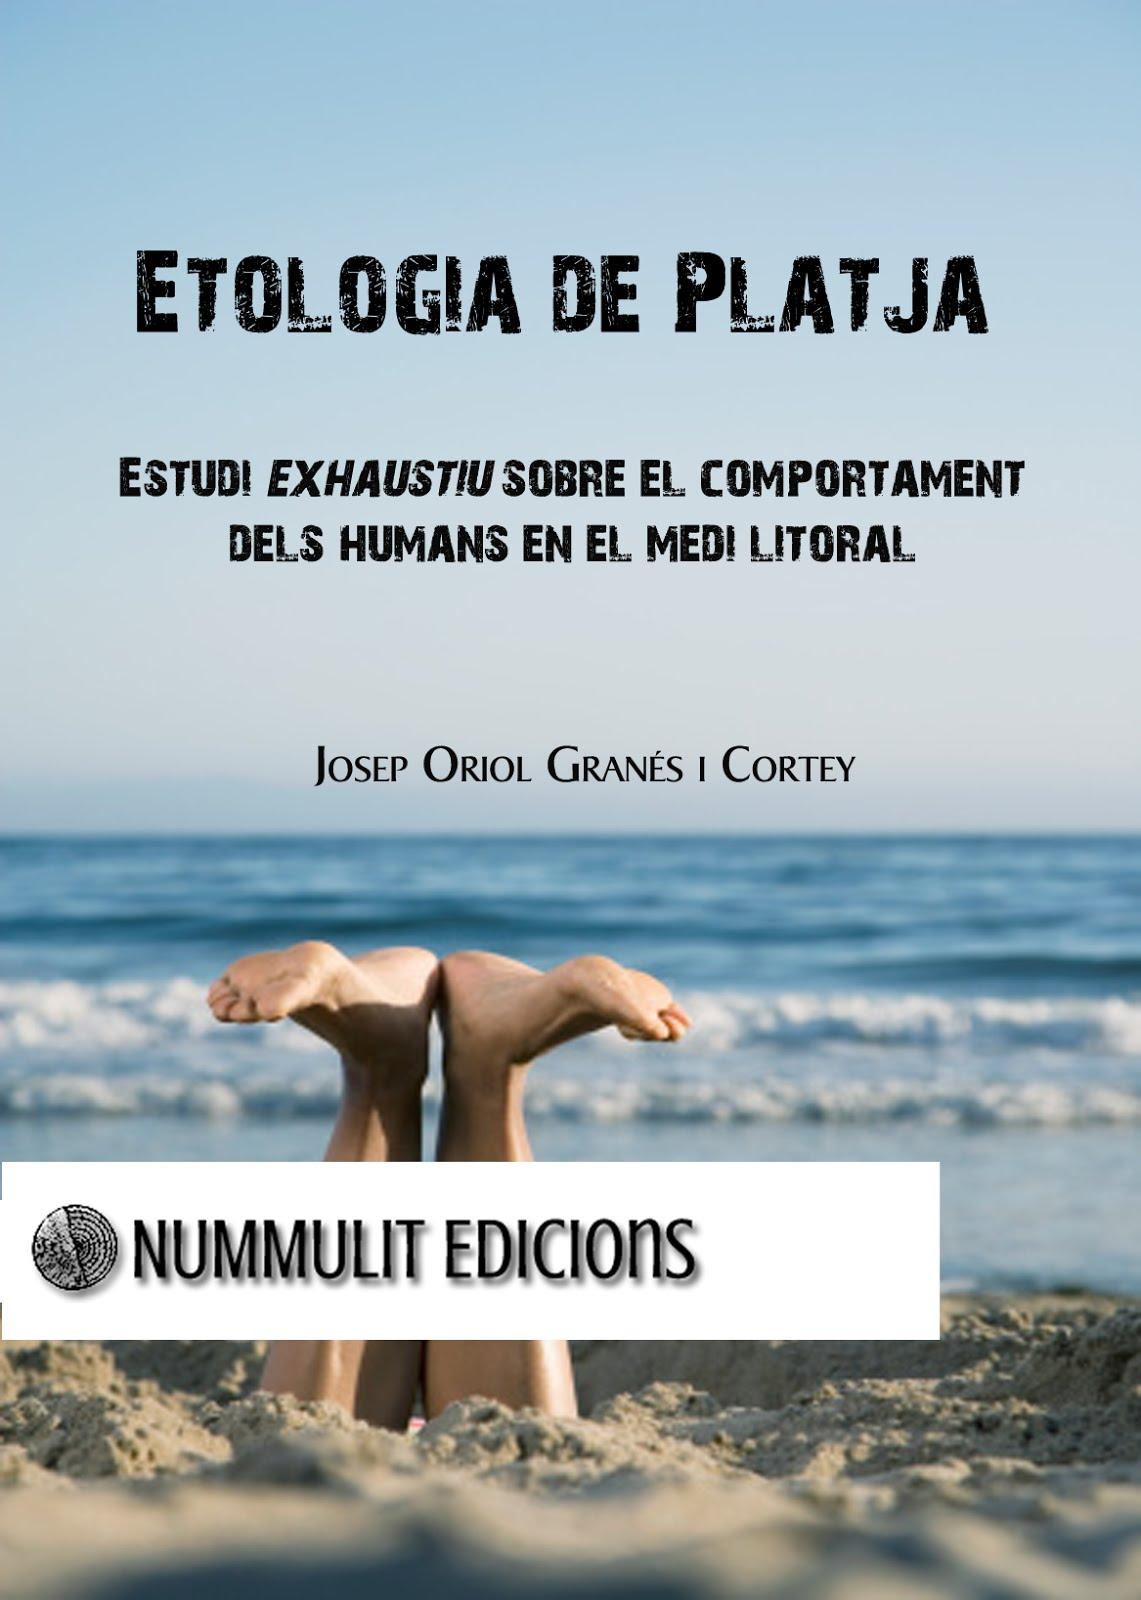 Etologia de platja